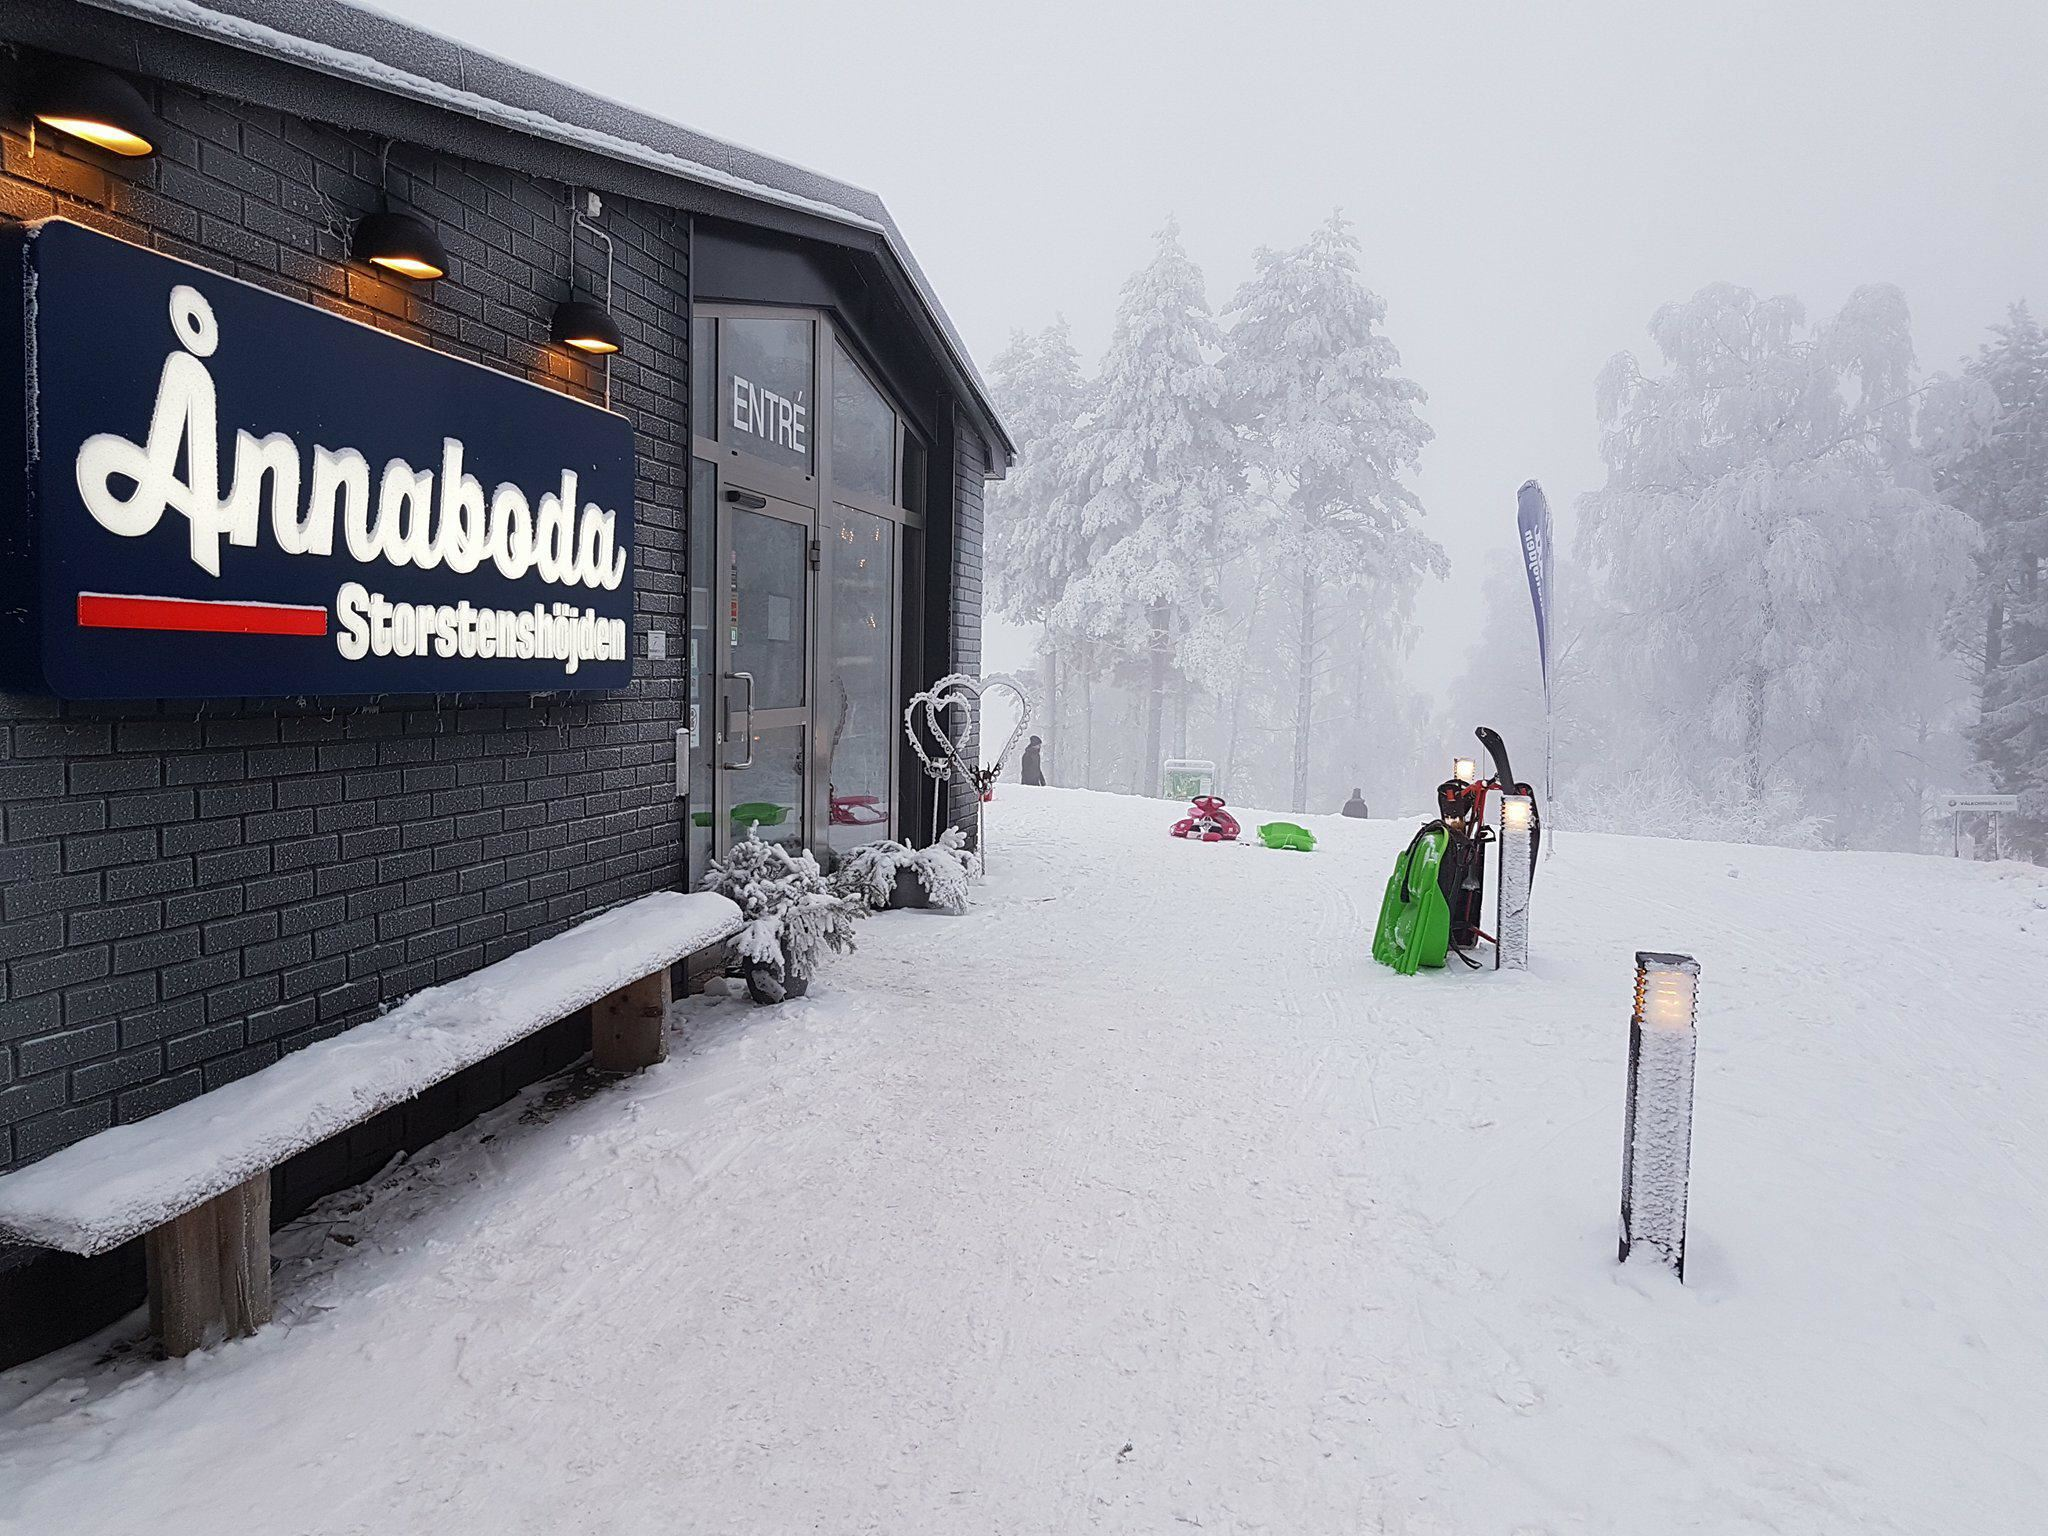 Nordic Camping Ånnaboda/Camping